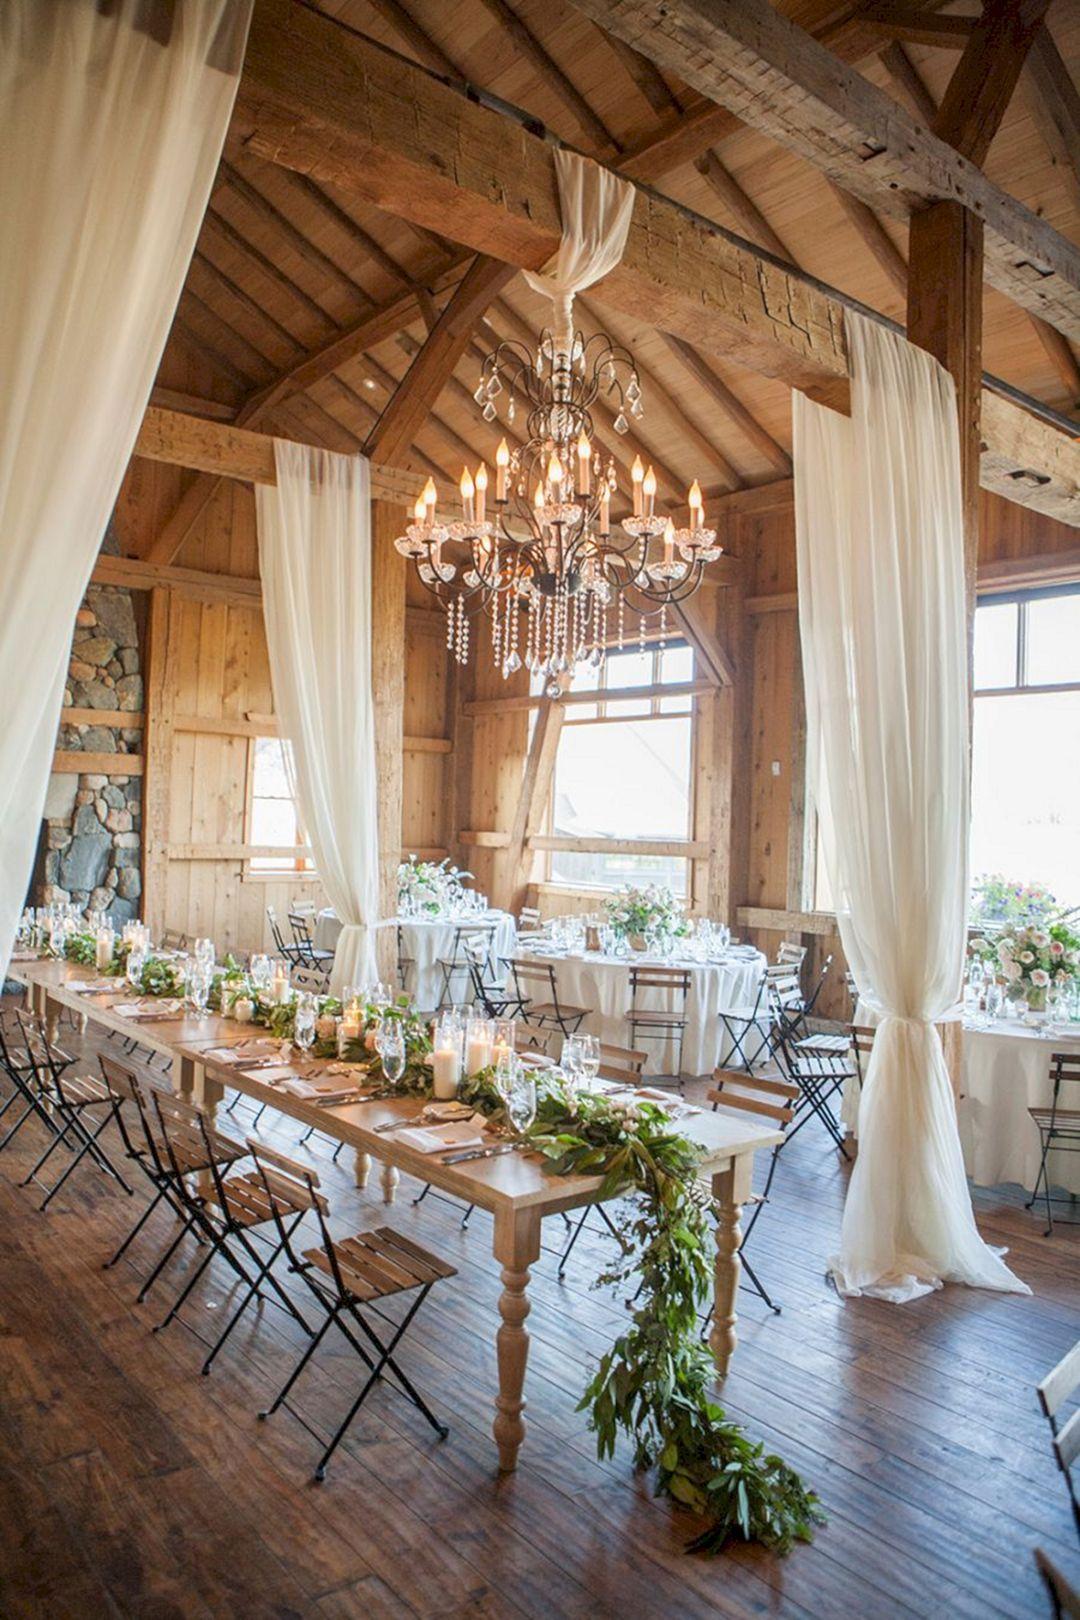 8 Amazing Barn Wedding Venue Decorations for Amazing ...